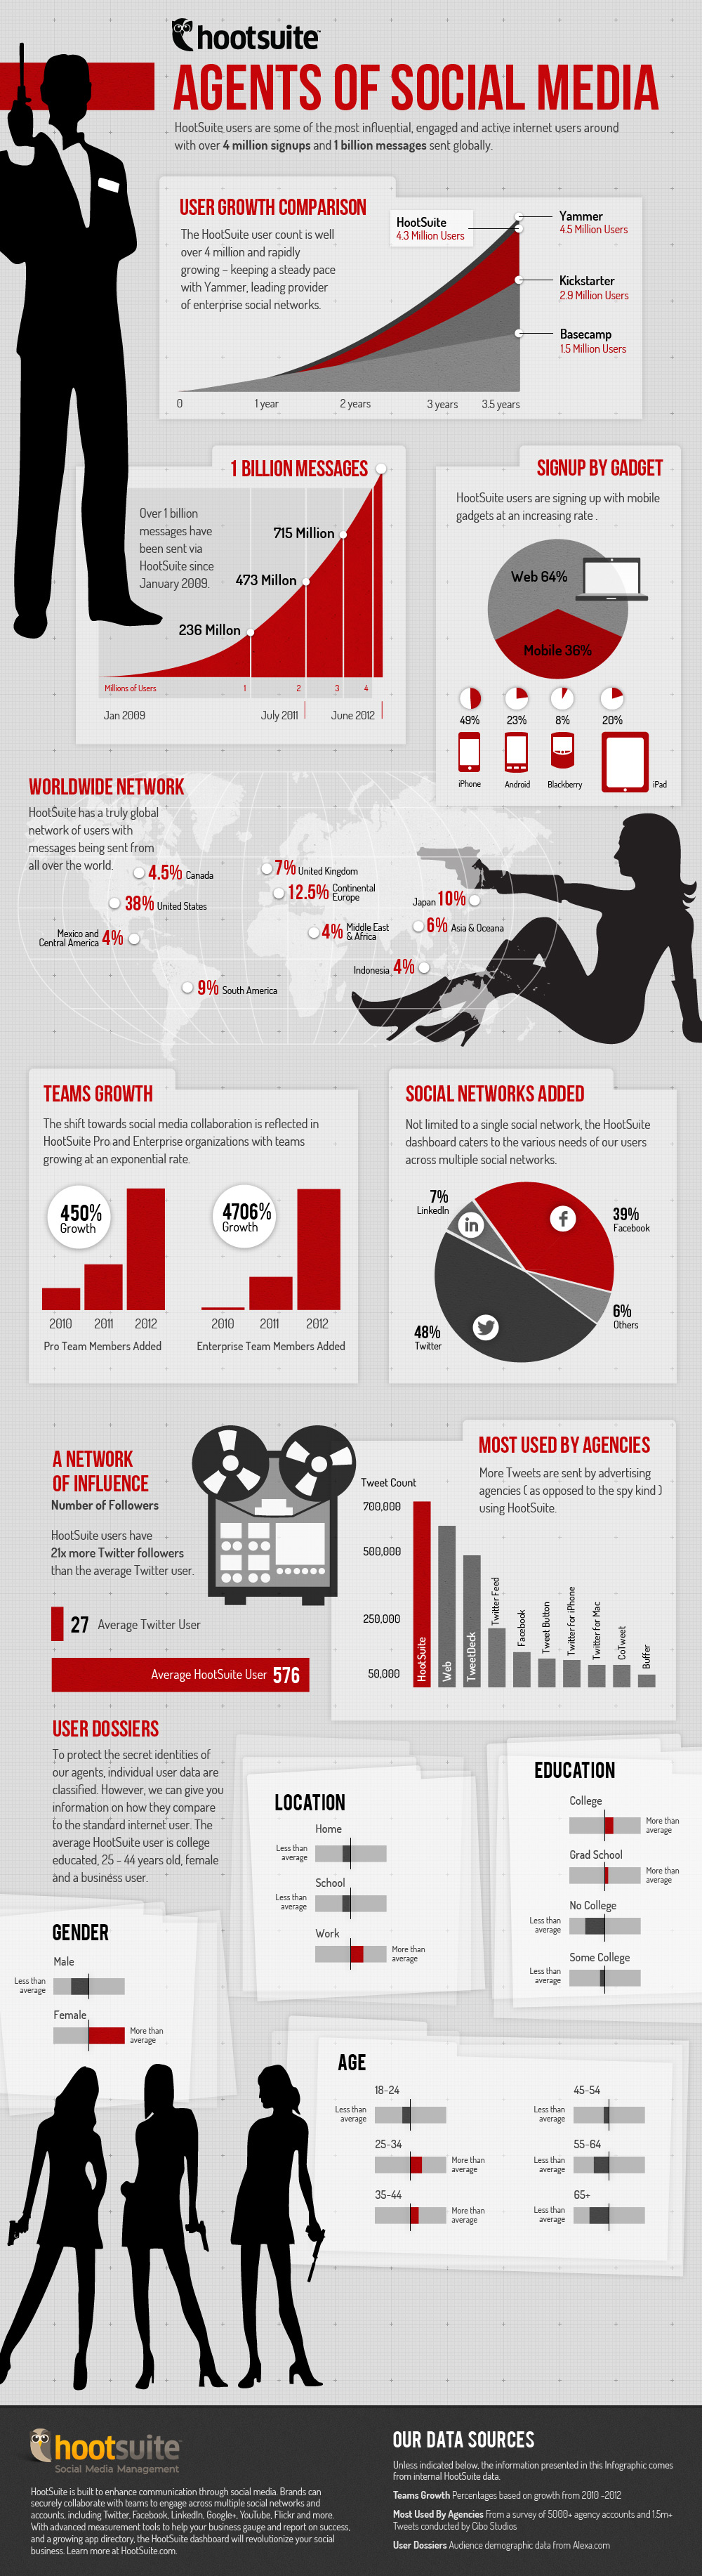 agents-of-social-media_50a6b445bef0f